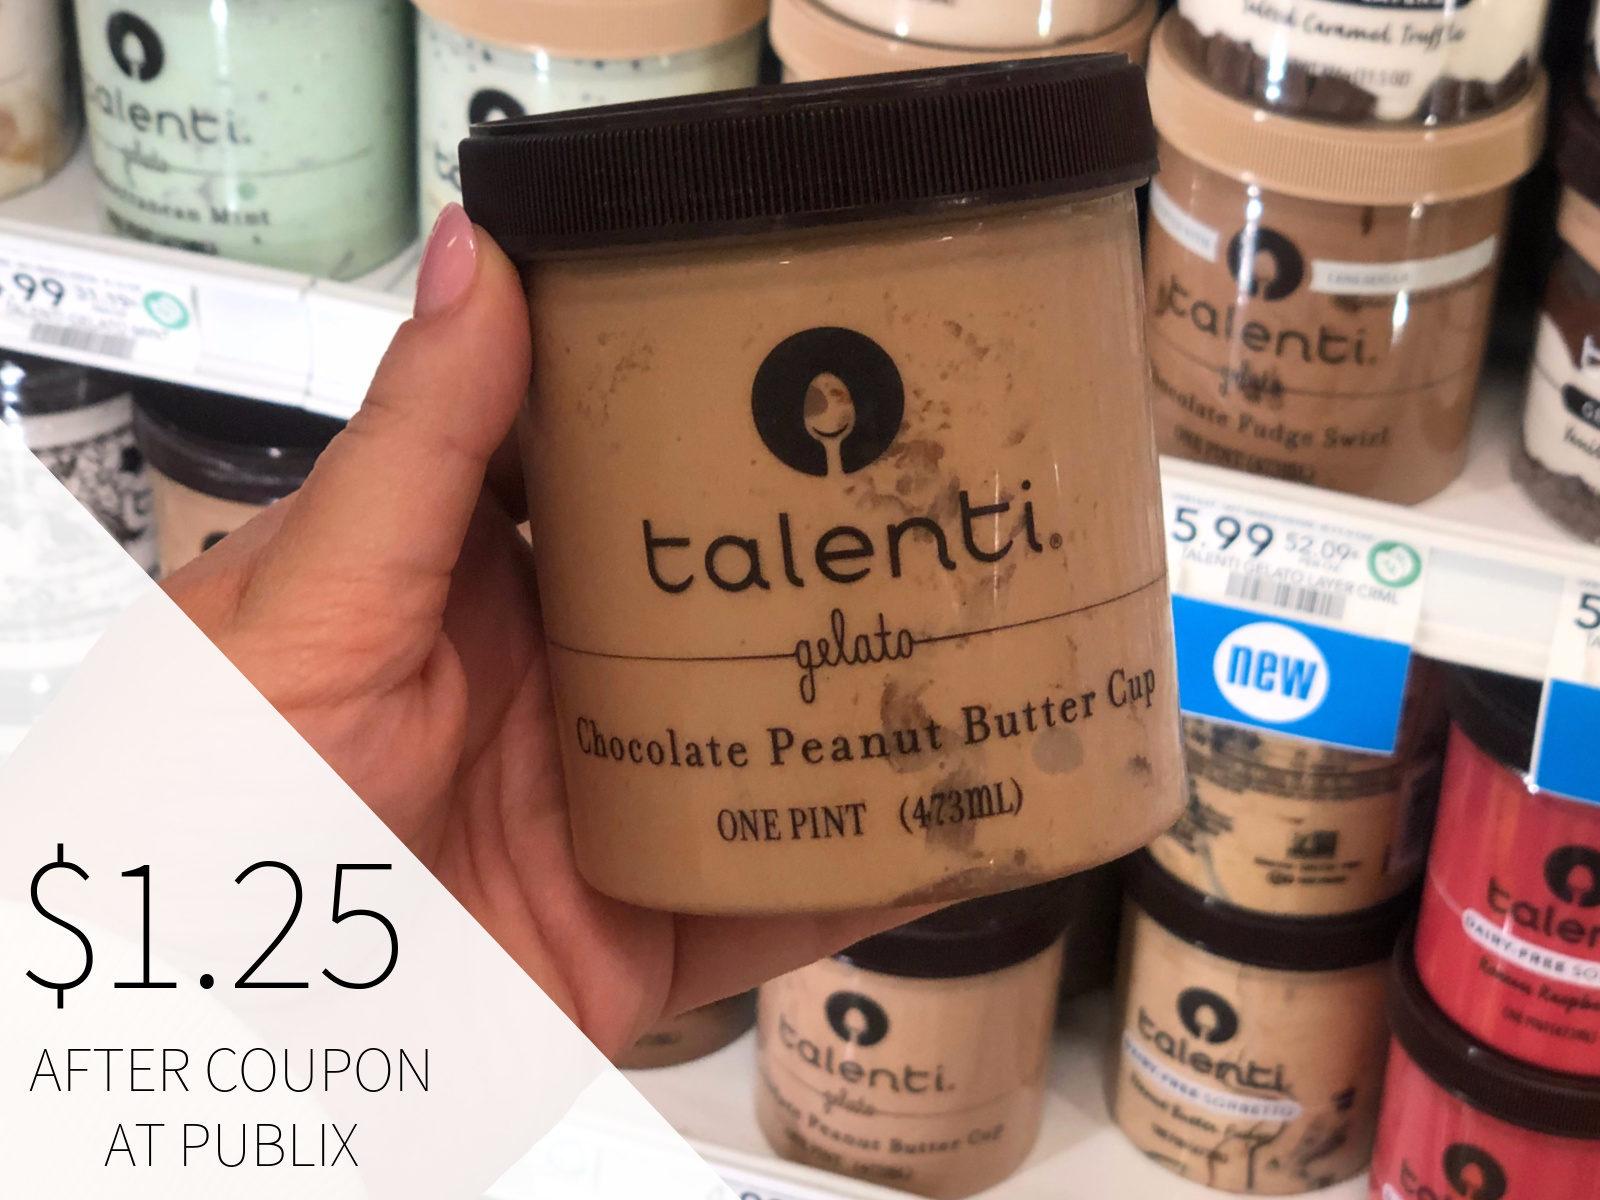 Talenti Gelato or Sorbetto Just $1.25 At Publix on I Heart Publix